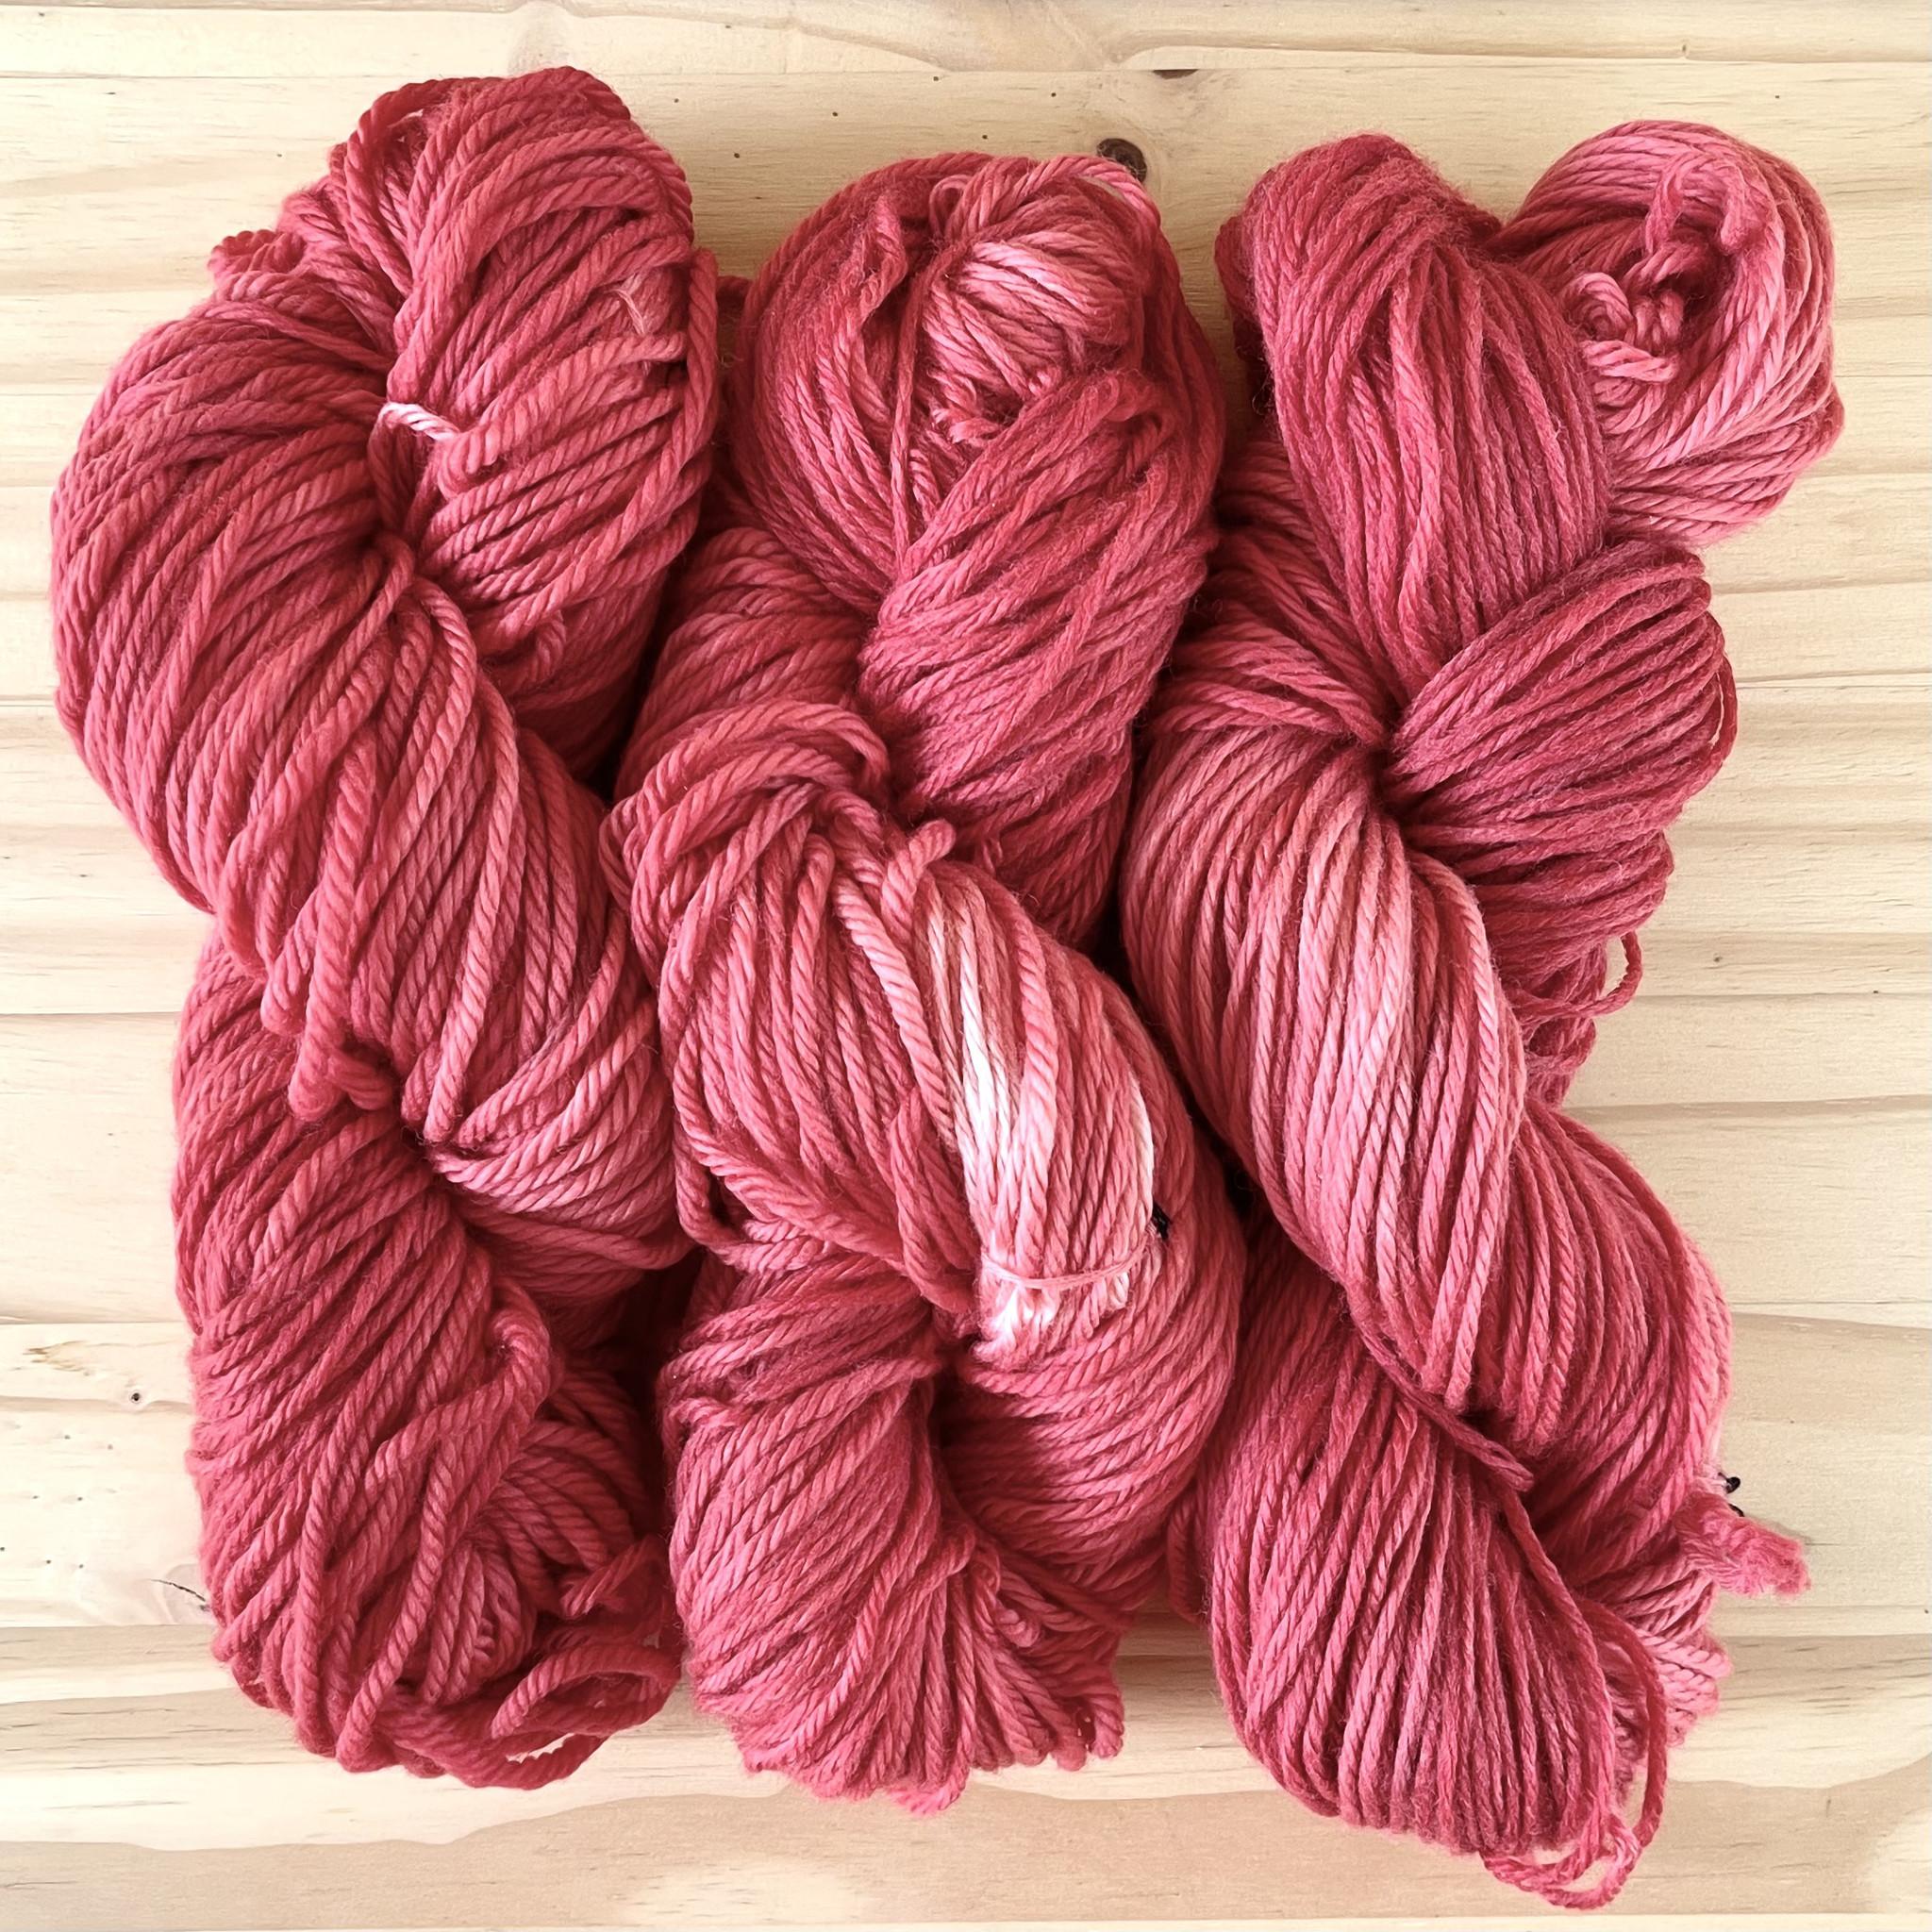 Hand Dyed Yarn : Madder Red